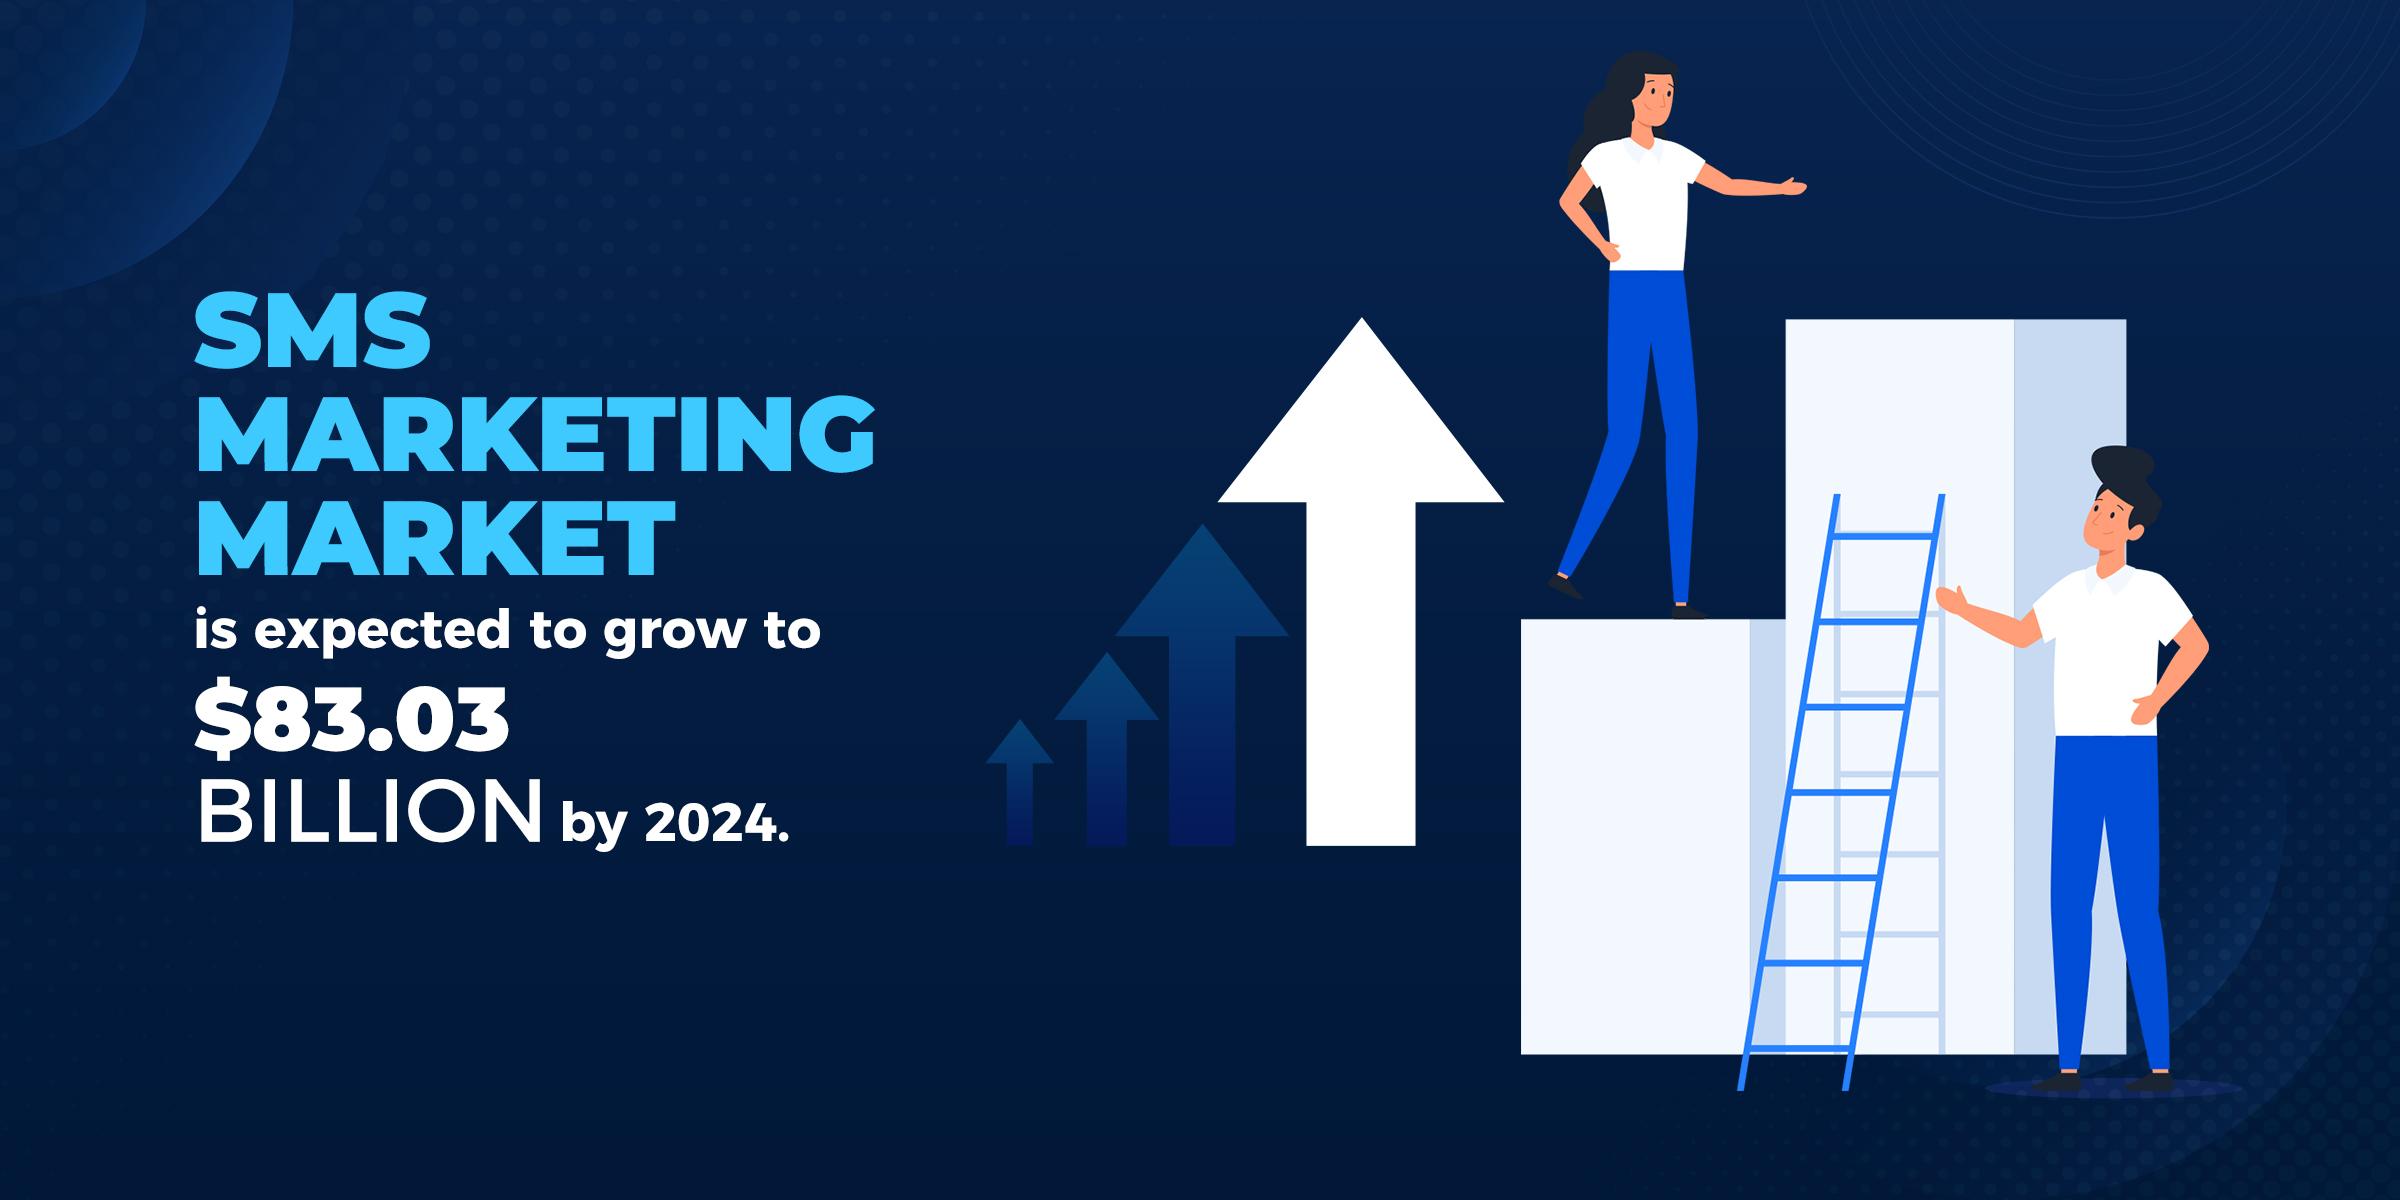 SMS Marketing Statistics - Industry Growth